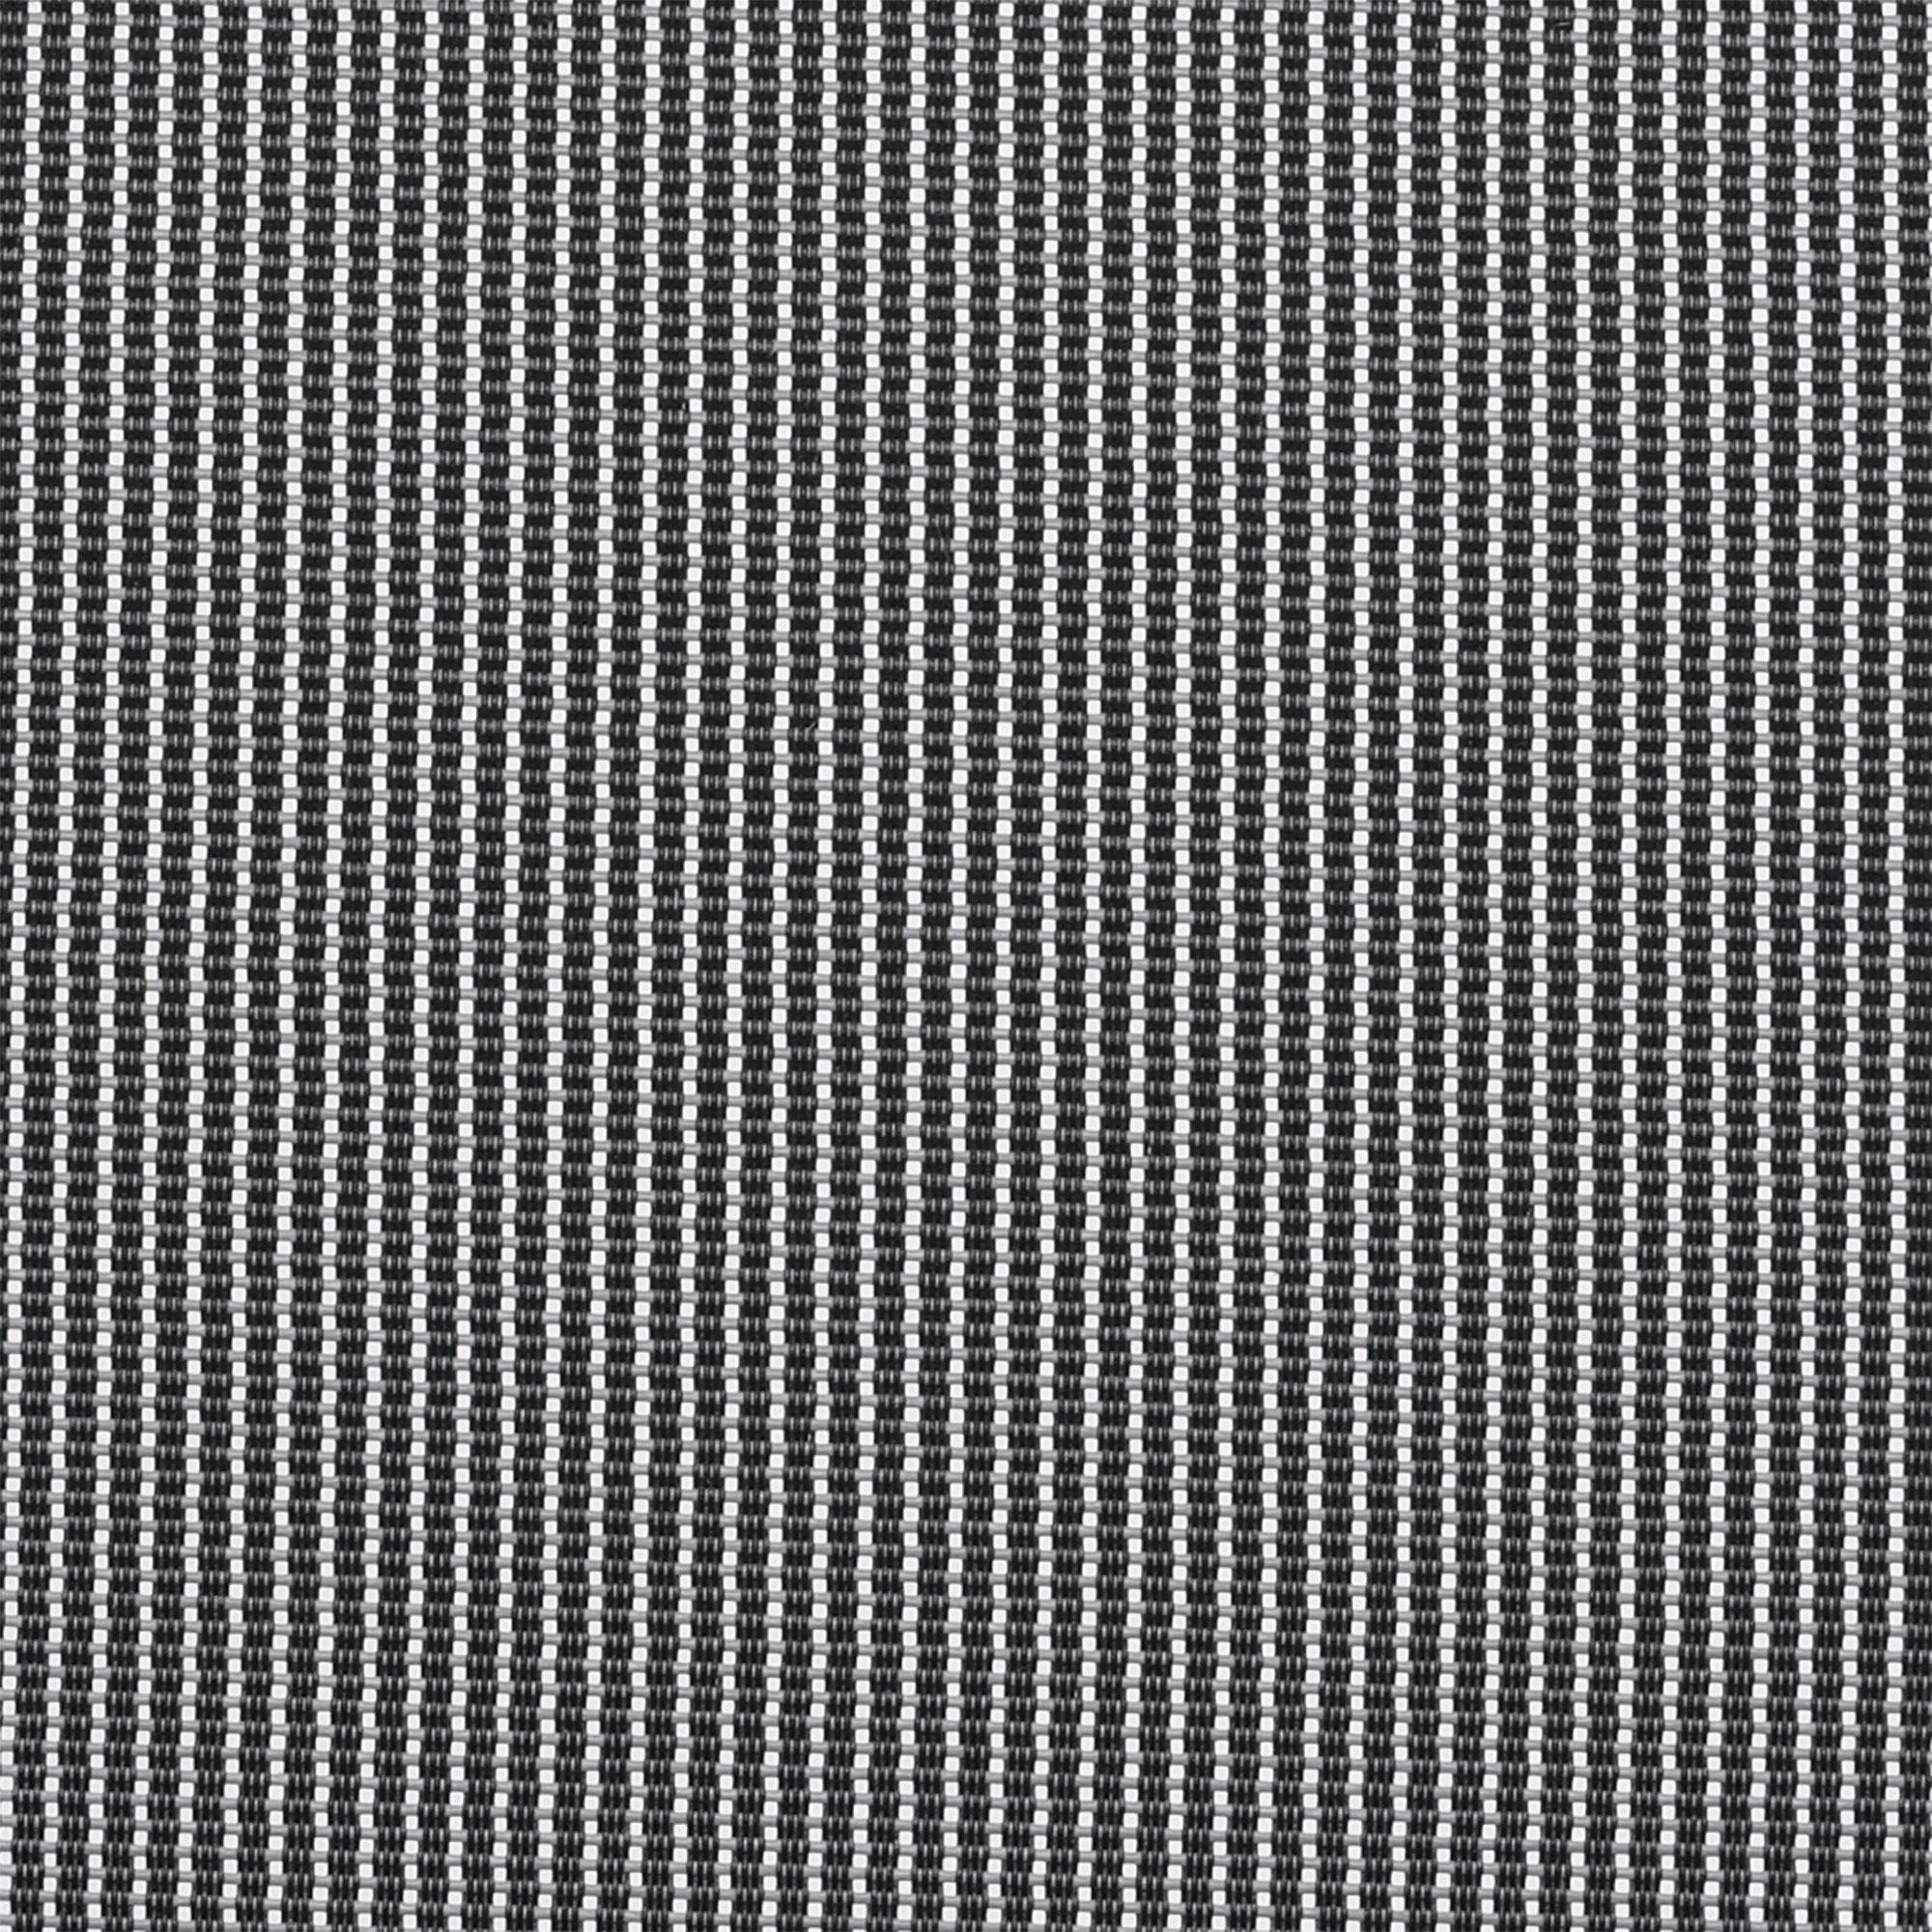 swatch-3000-v02-ninja-grey-web.jpg